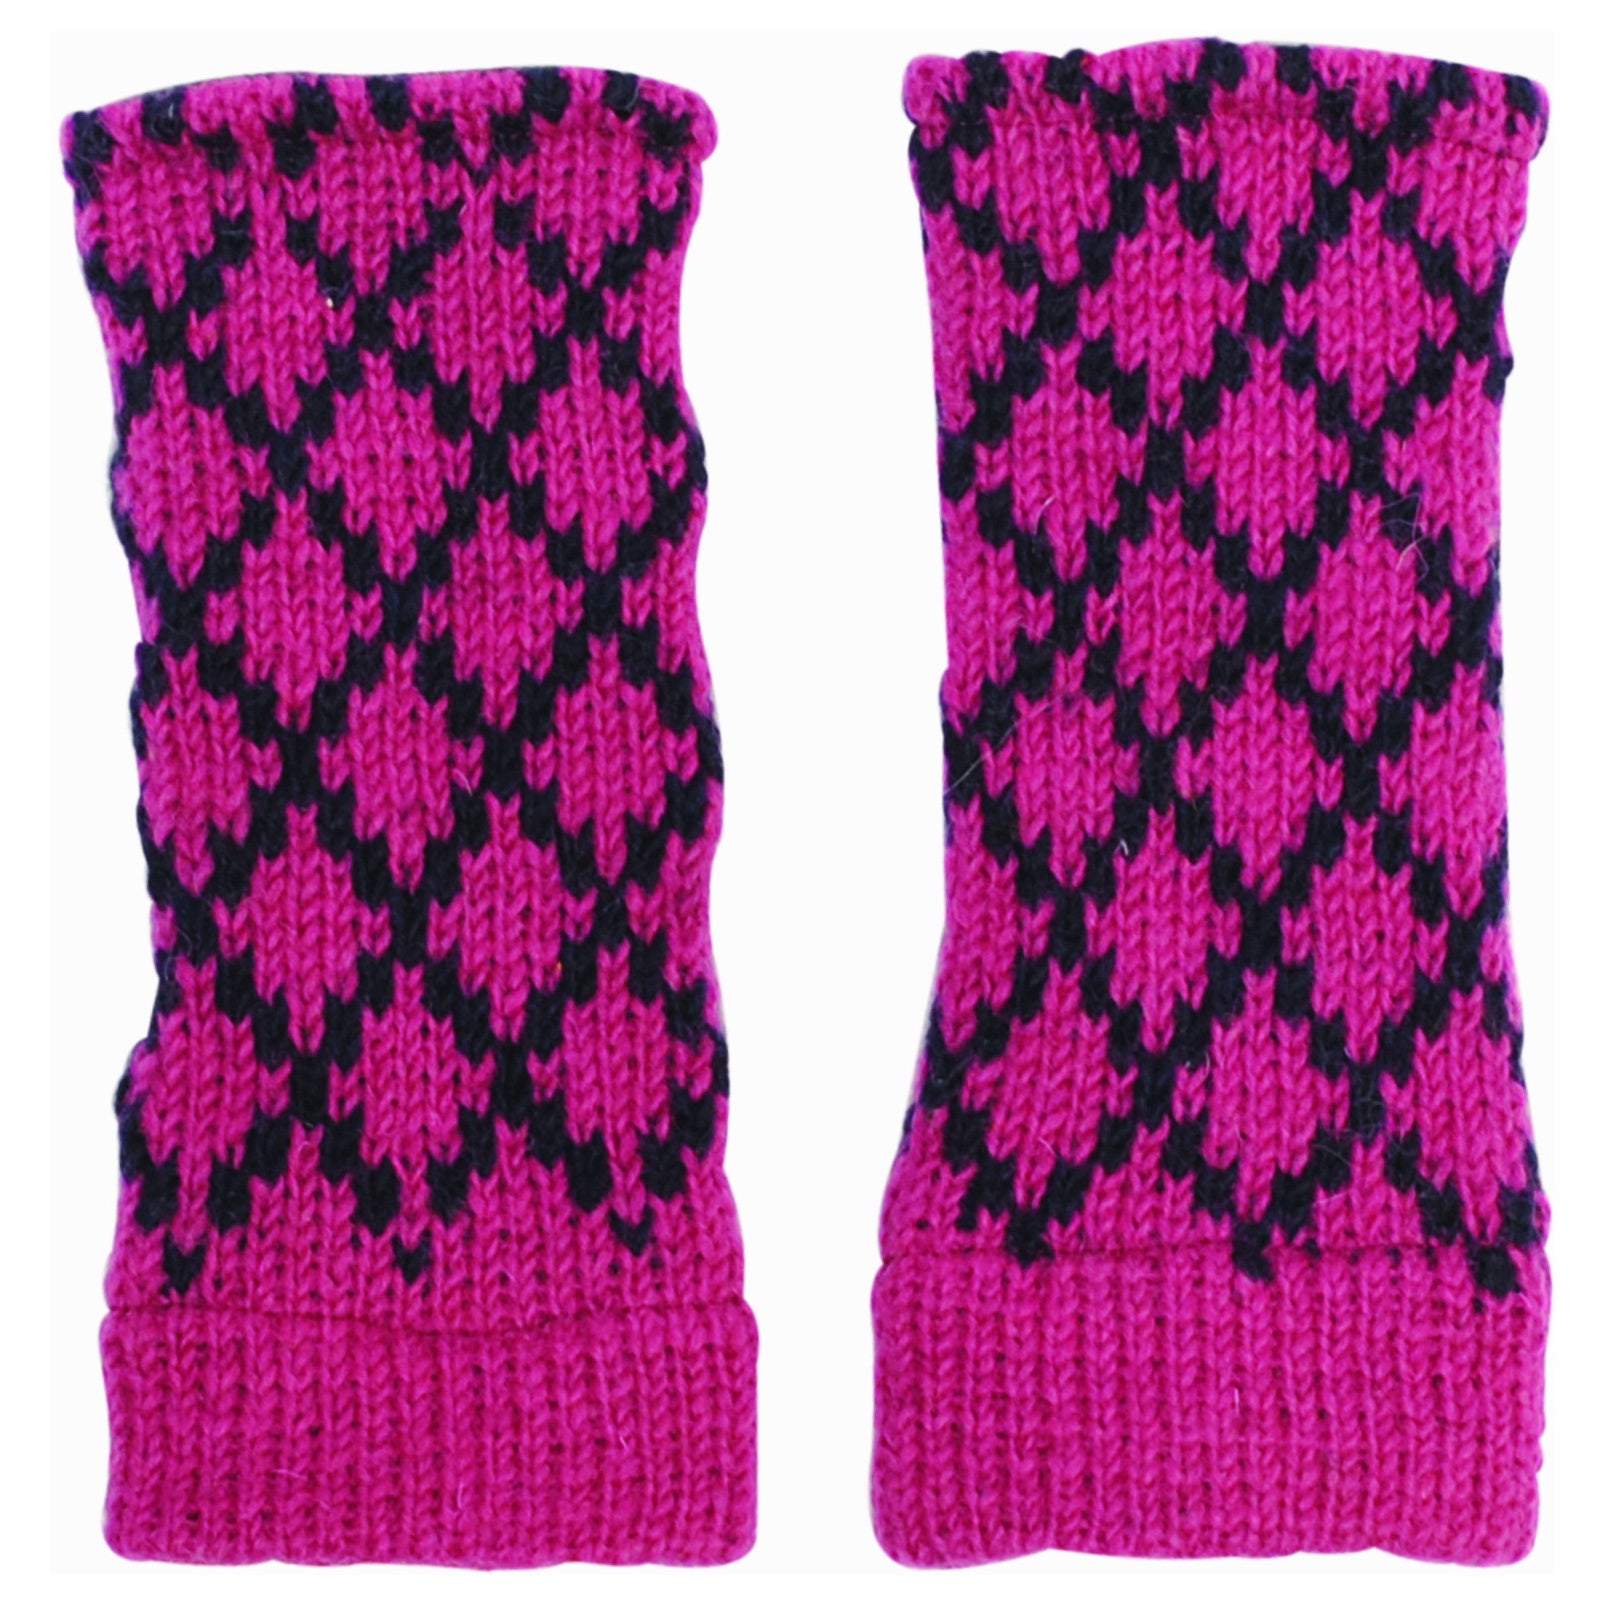 Handmade Women's Winter Classic Wool Knit Glittens Finger...